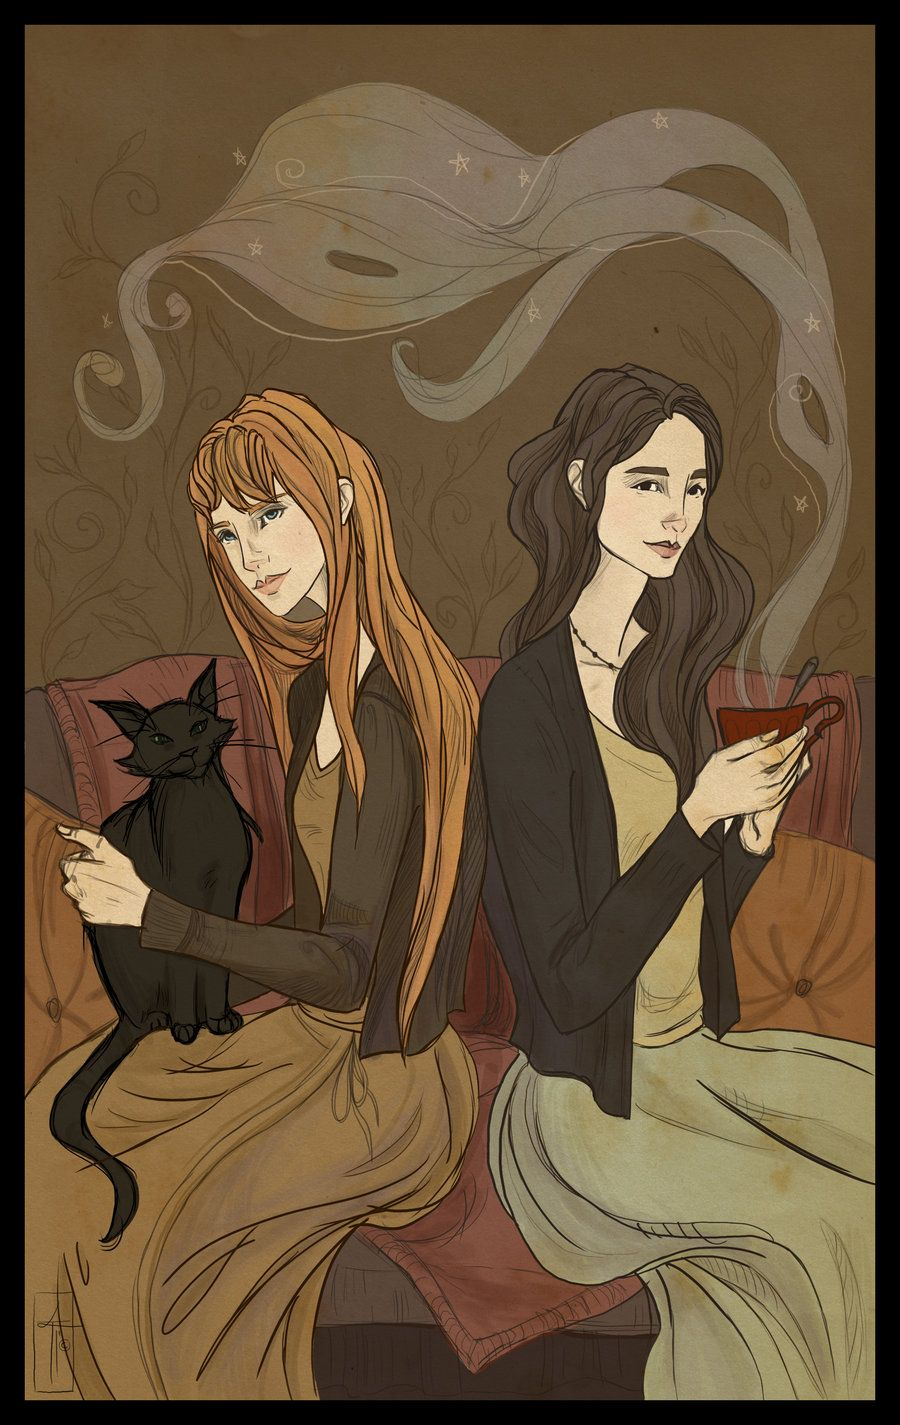 Sisters Reminds Me Of Practical Magic Hechizo De Amor Sandra Circuitry By Brujo On Deviantart Bigdave409 Bullock Nichole Kidman